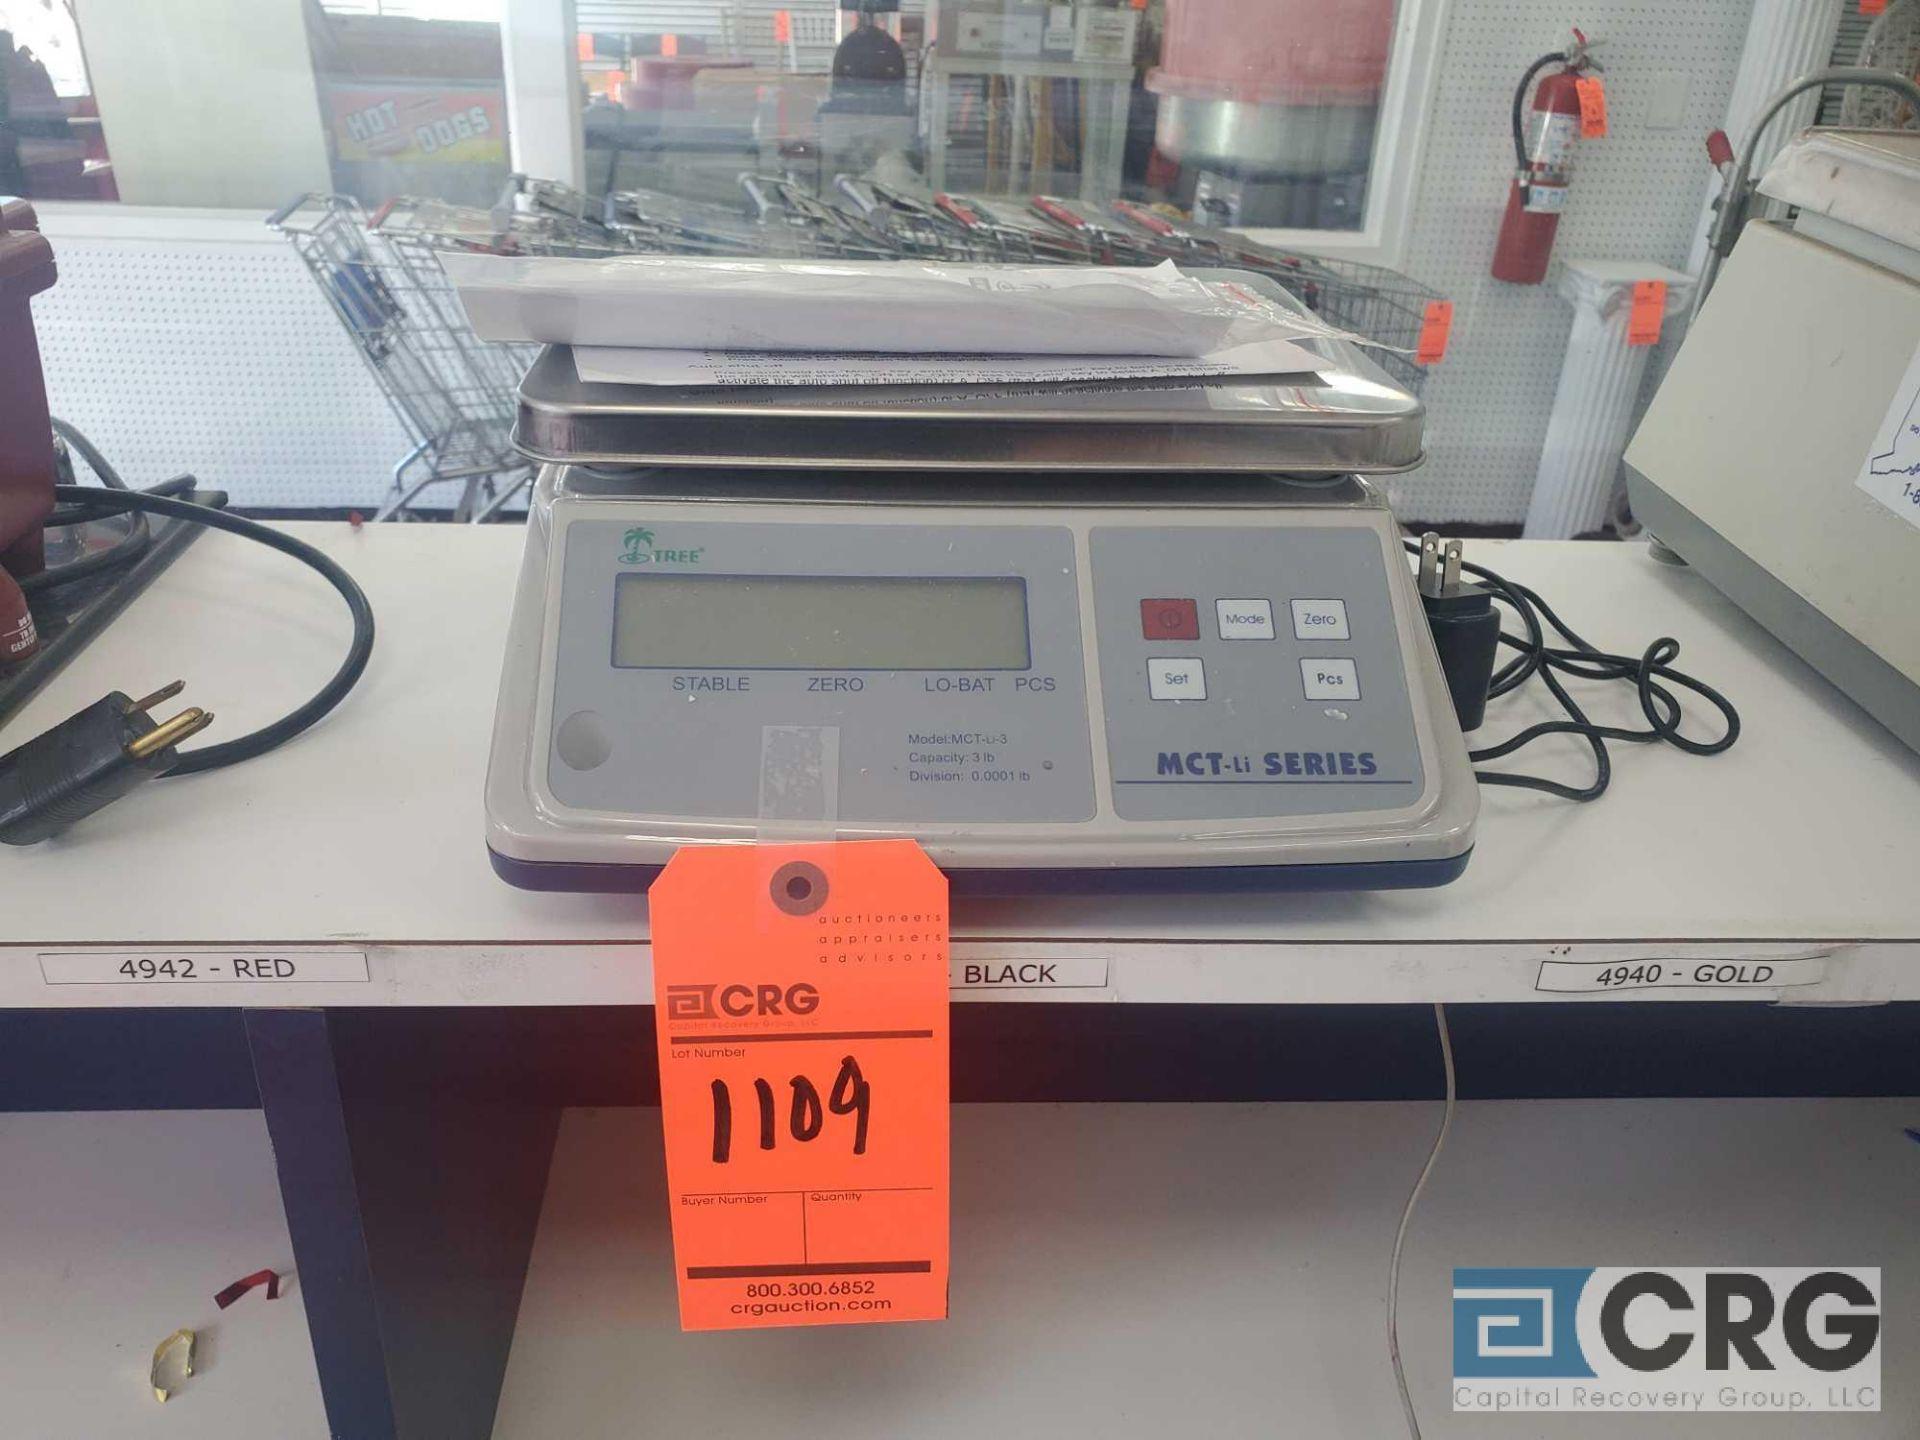 Lot 1109 - Tree MCT-LI 3 lb capacity precision scale